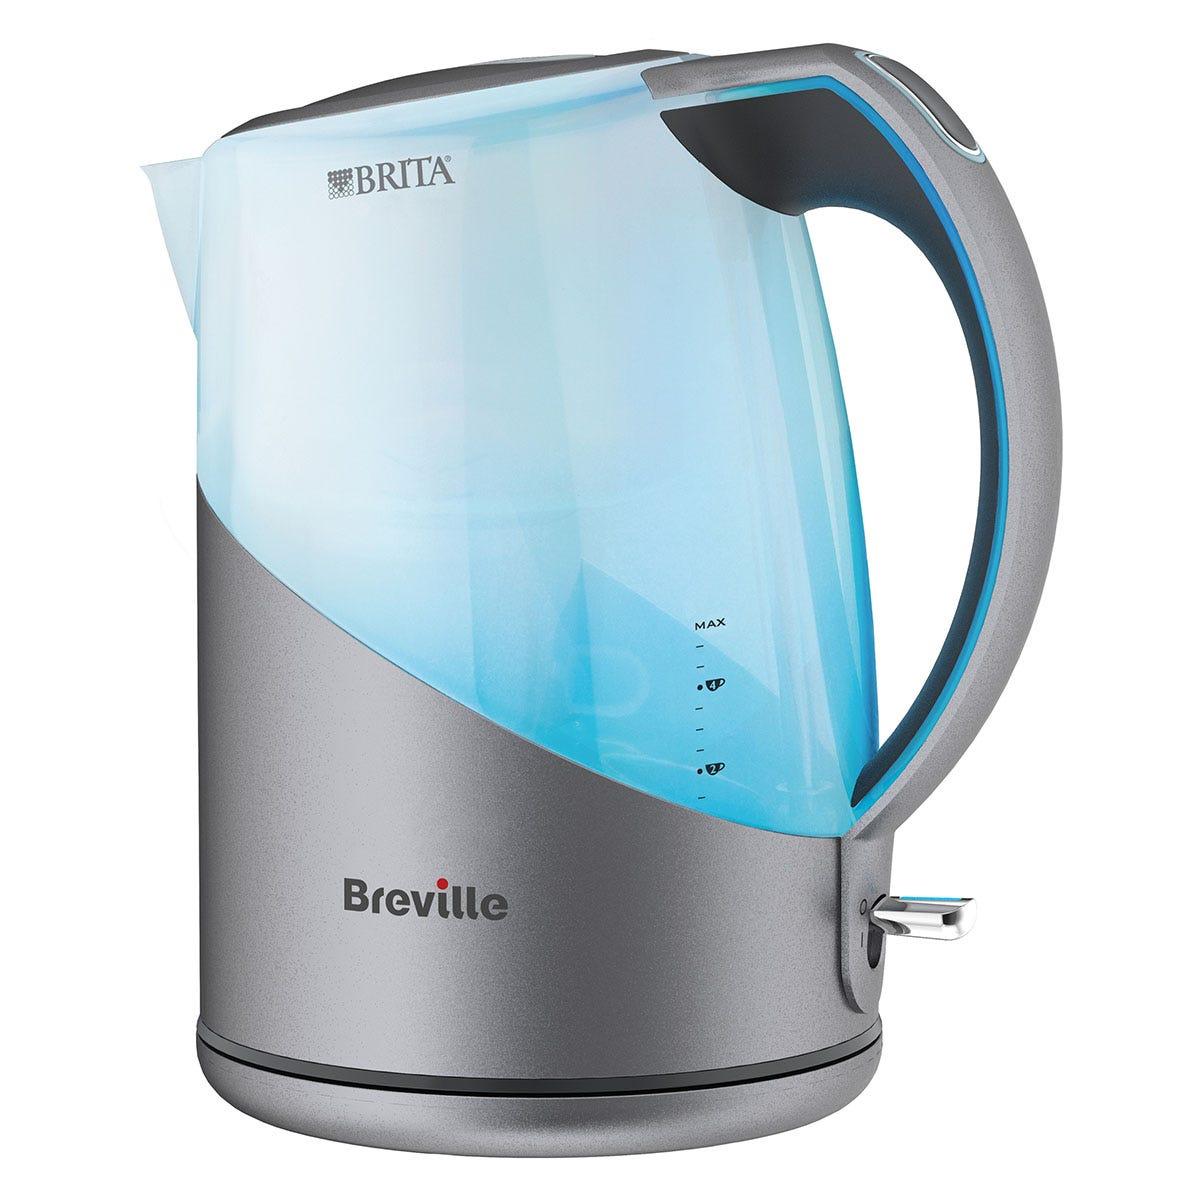 Breville VKJ972 3000W 1L Brita Filter Jug Kettle - Silver